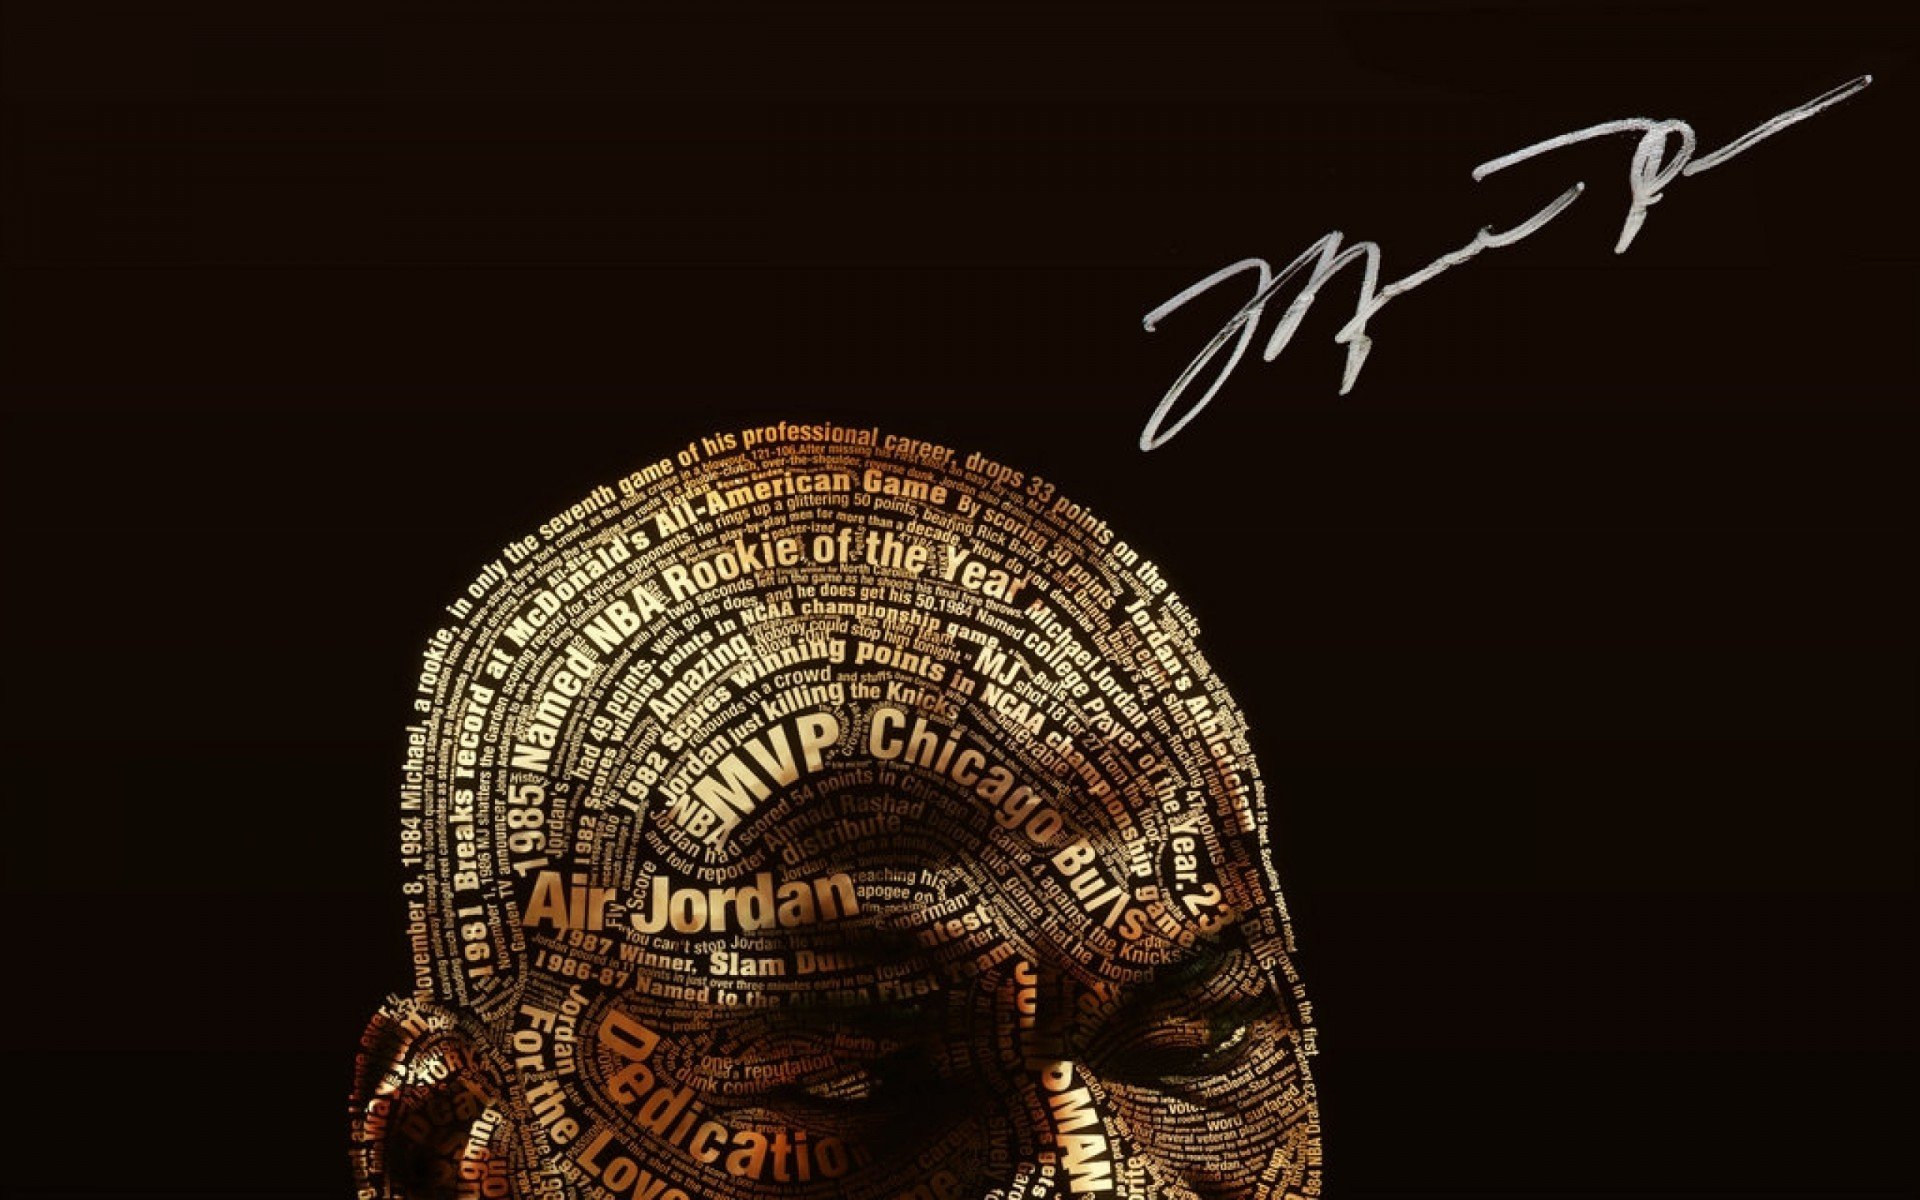 Michael Jordan Wallpapers HD Desktop Backgrounds Images And Pictures 1920x1200